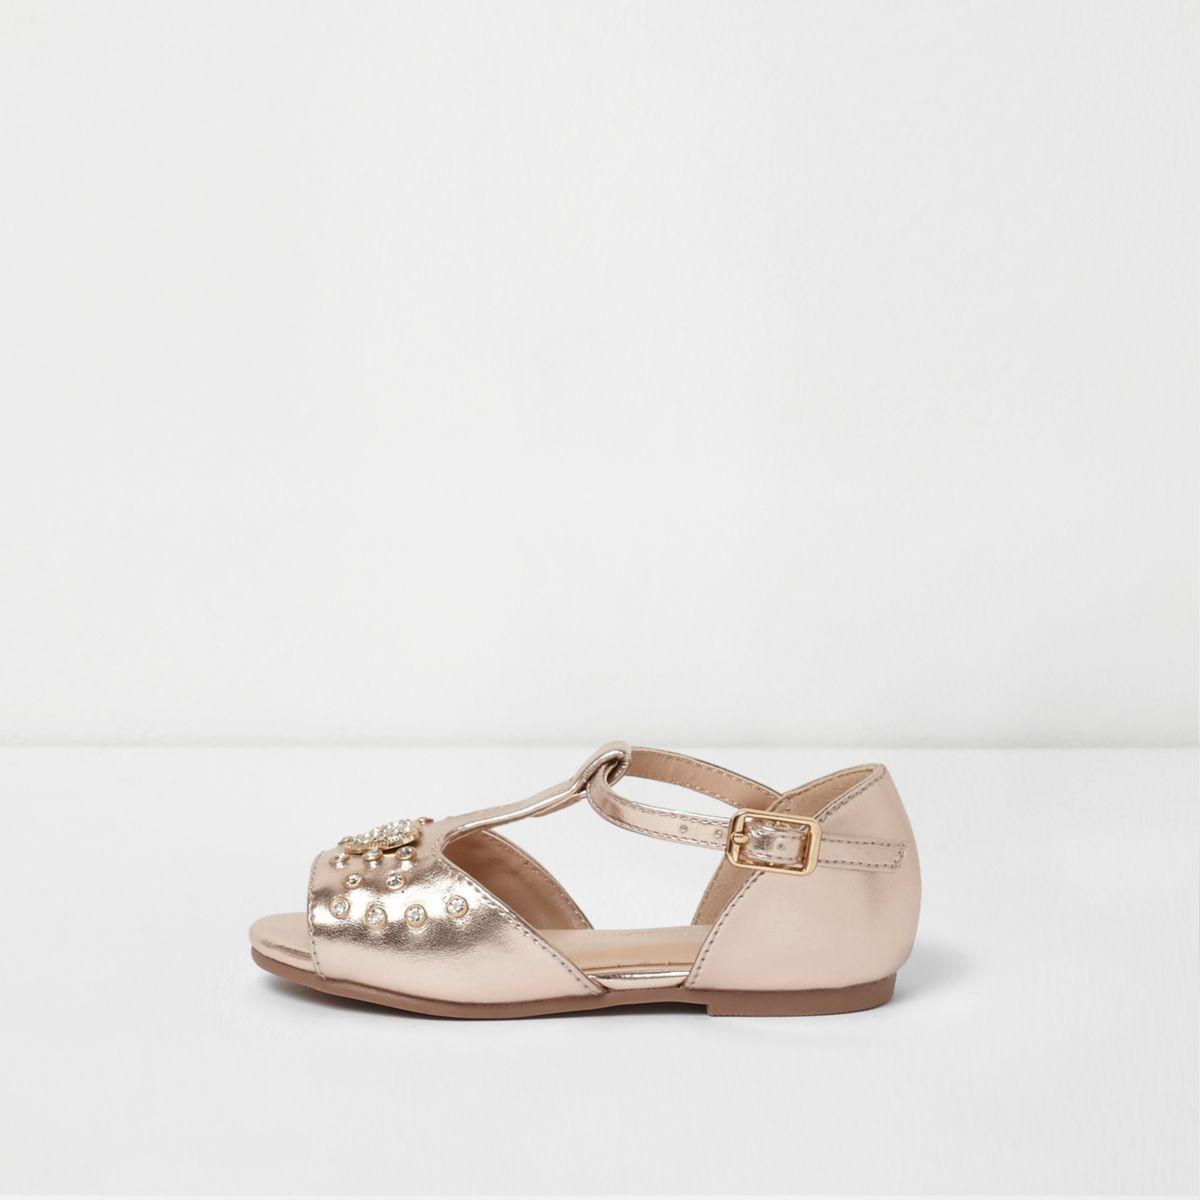 Girls River Island Rose Gold Loafer Shoes Size 9